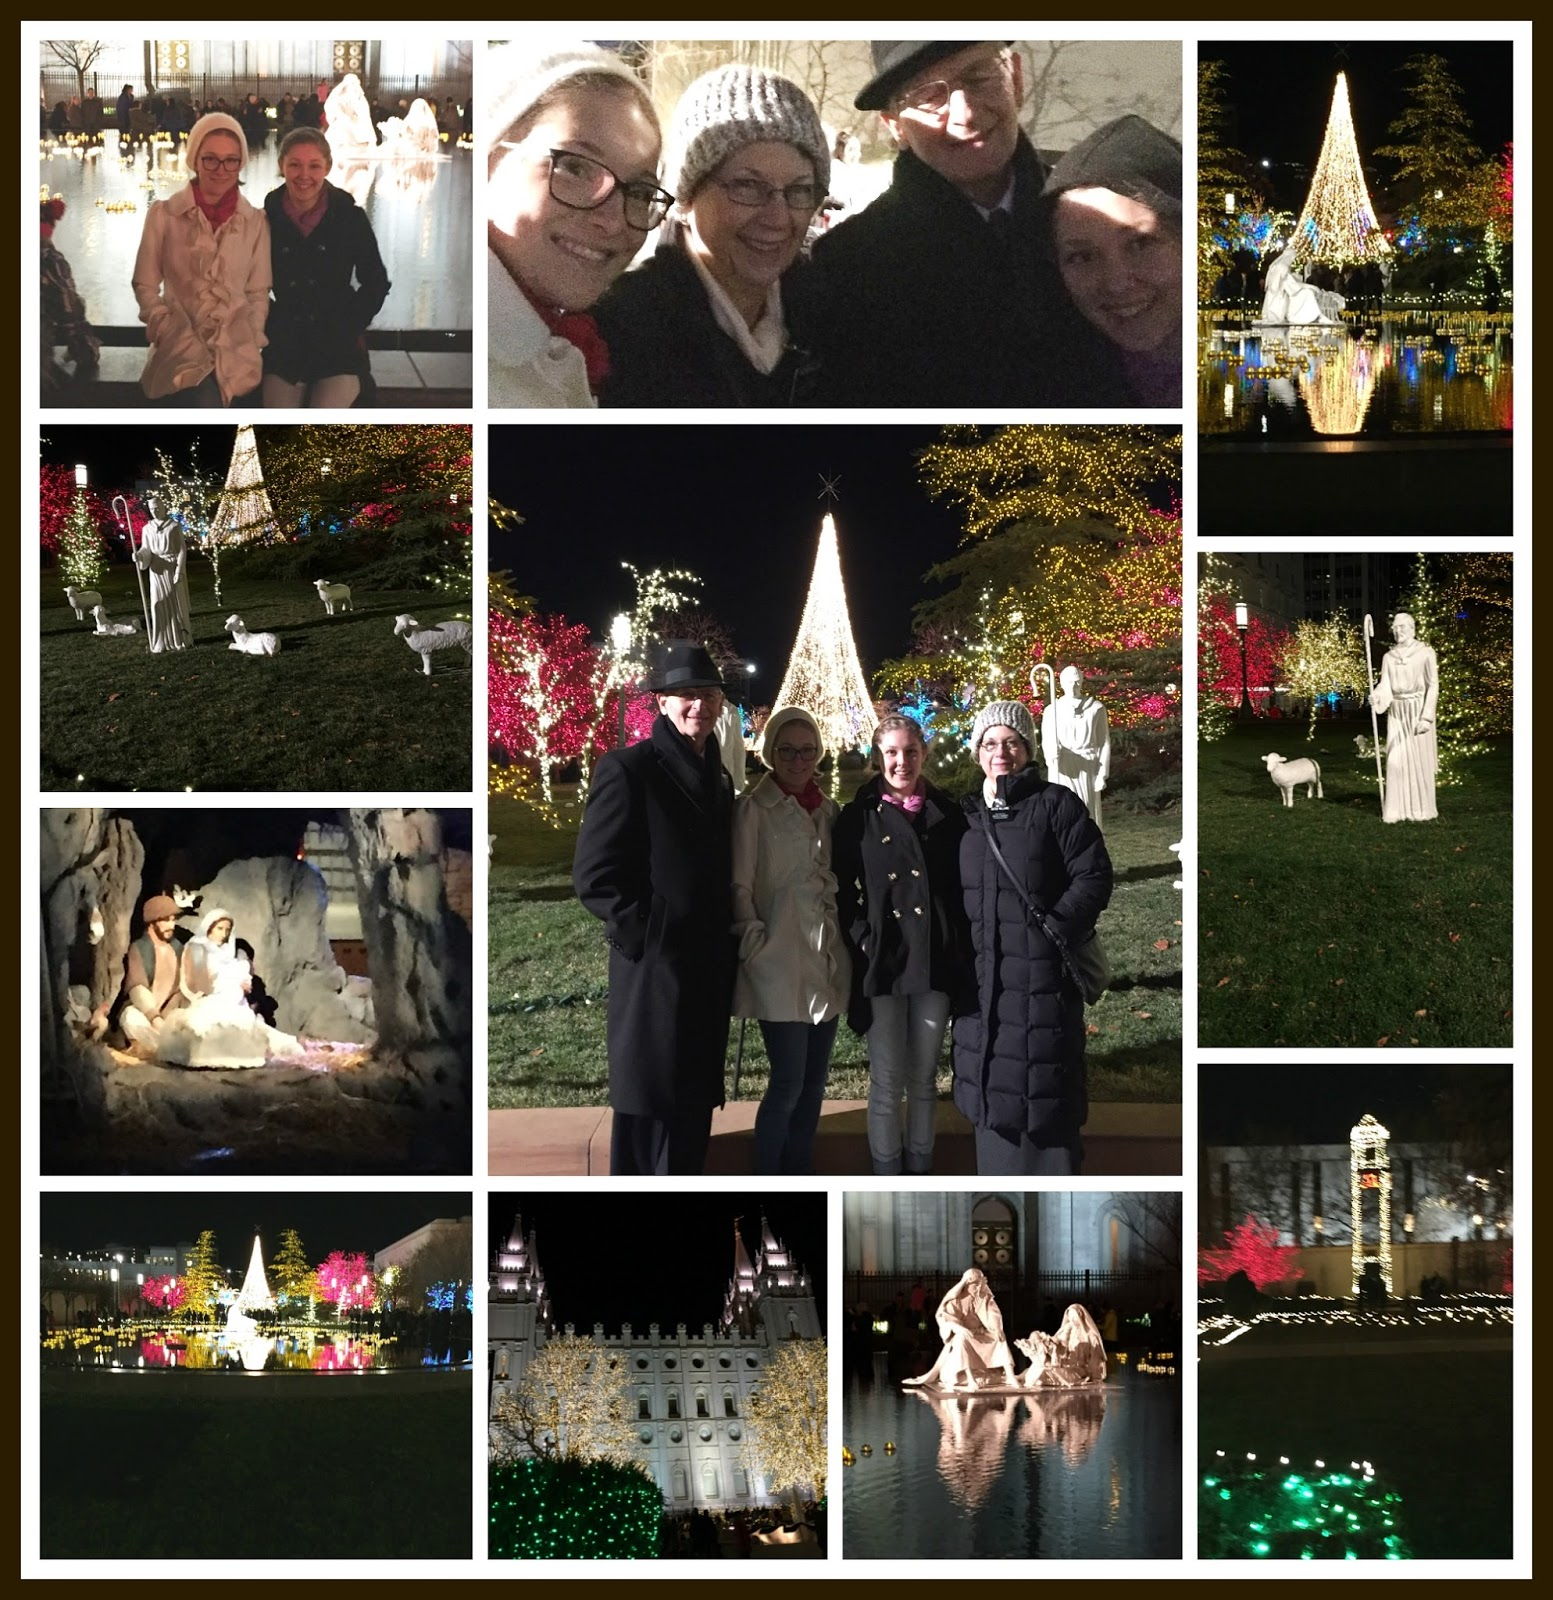 Waters Christmas Lights Target